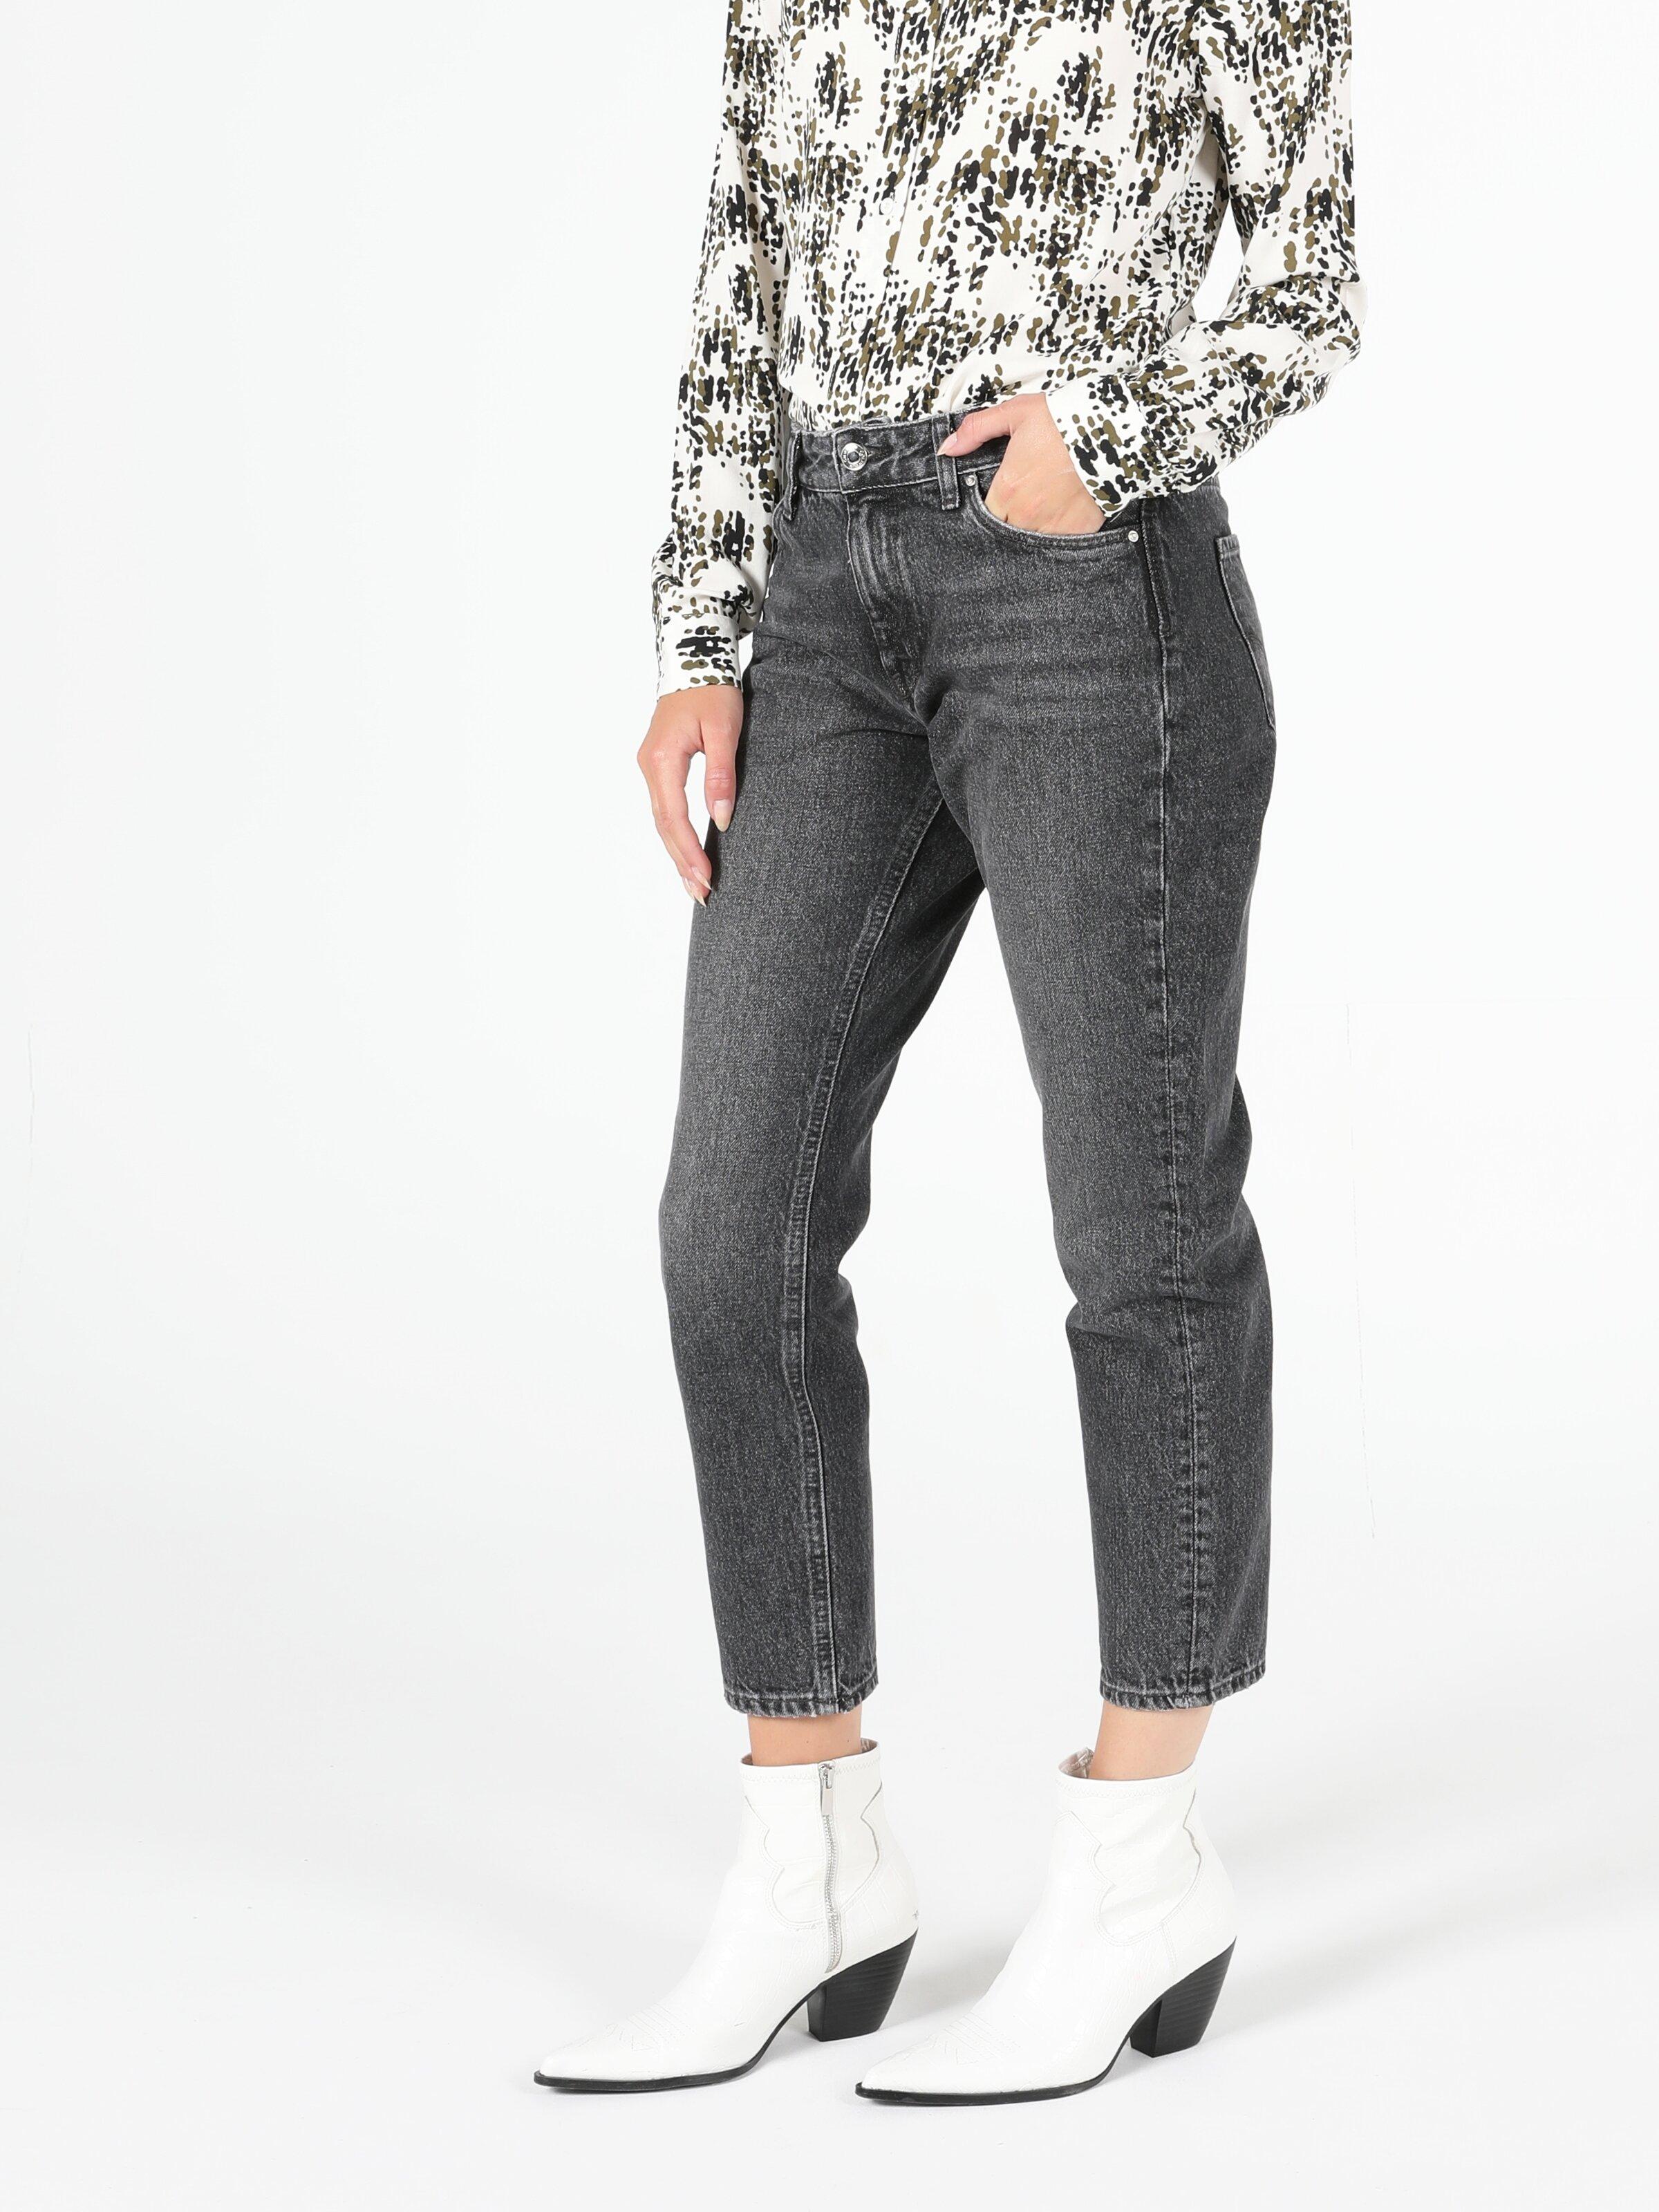 891 Maya Orta Bel Daralan Paça Slim Fit Jean Kadın Jean Pantolon